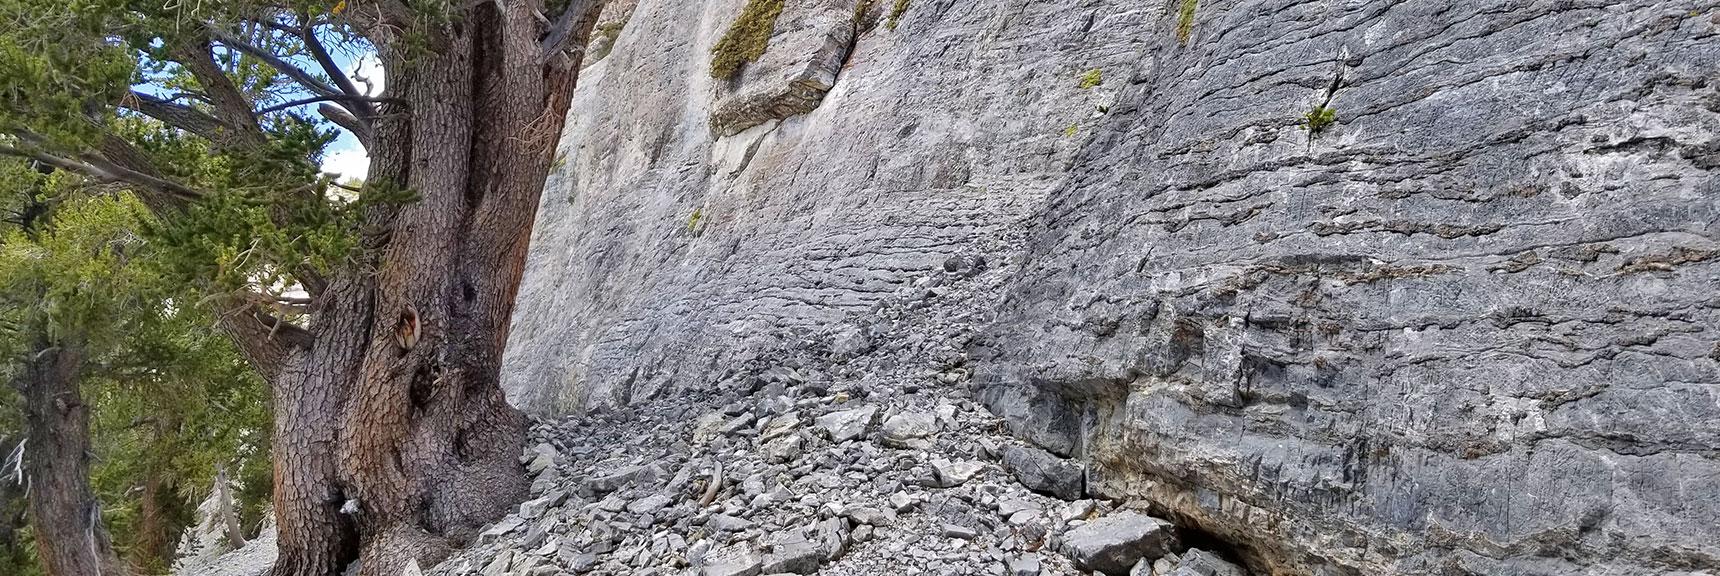 Base of Mummy Mountain Eastern Cliff   Mummy Mountain NNE, Mt. Charleston Wilderness, Nevada, Slide 014